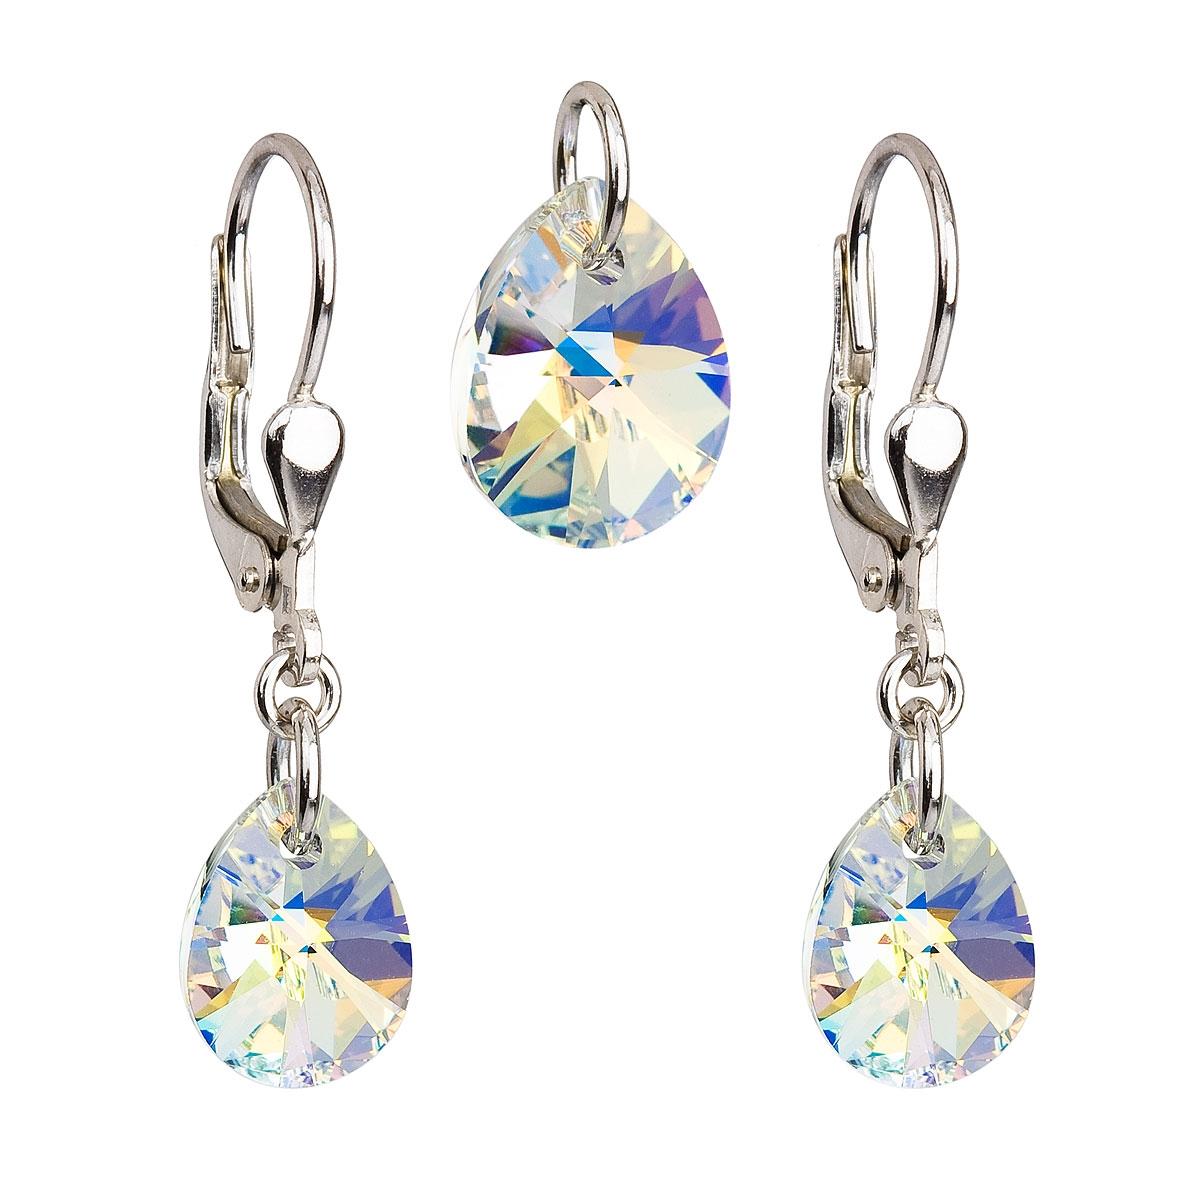 Sada šperků - kapky Crystals from Swarovski® AB EG3032-AB